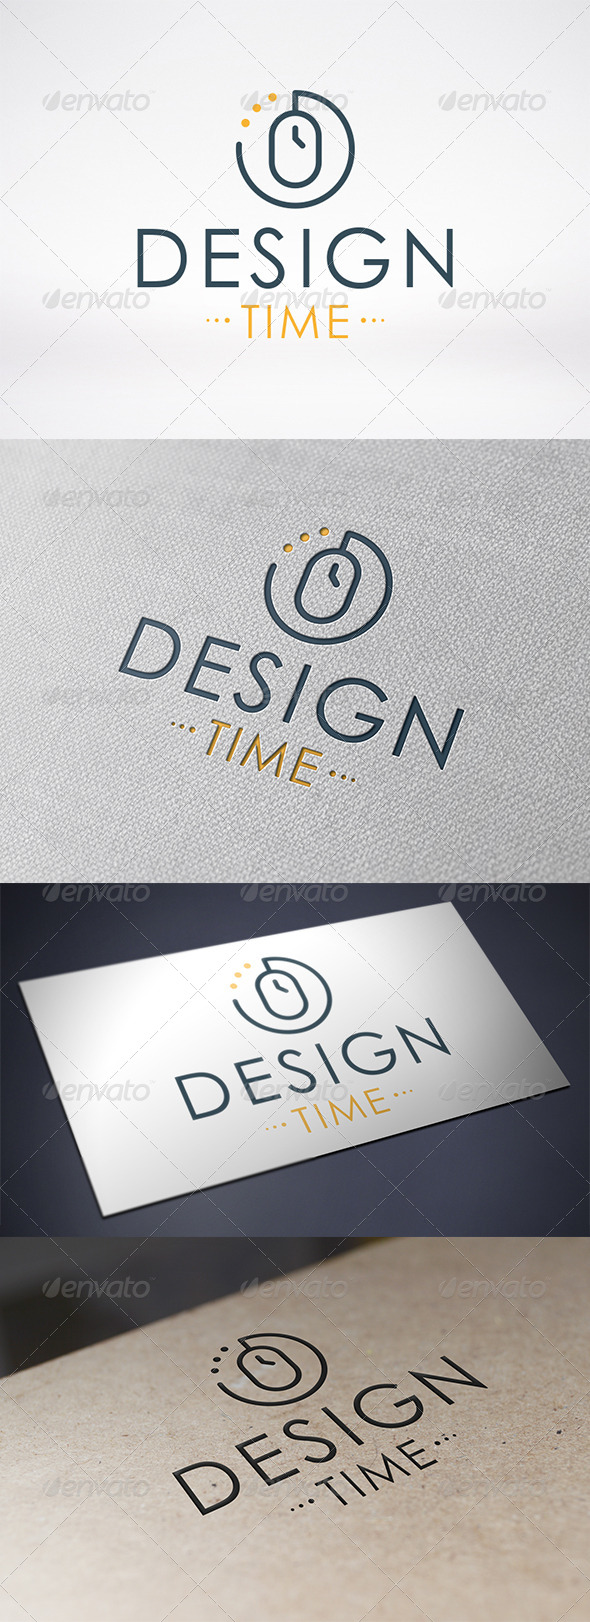 Design Time Logo Template